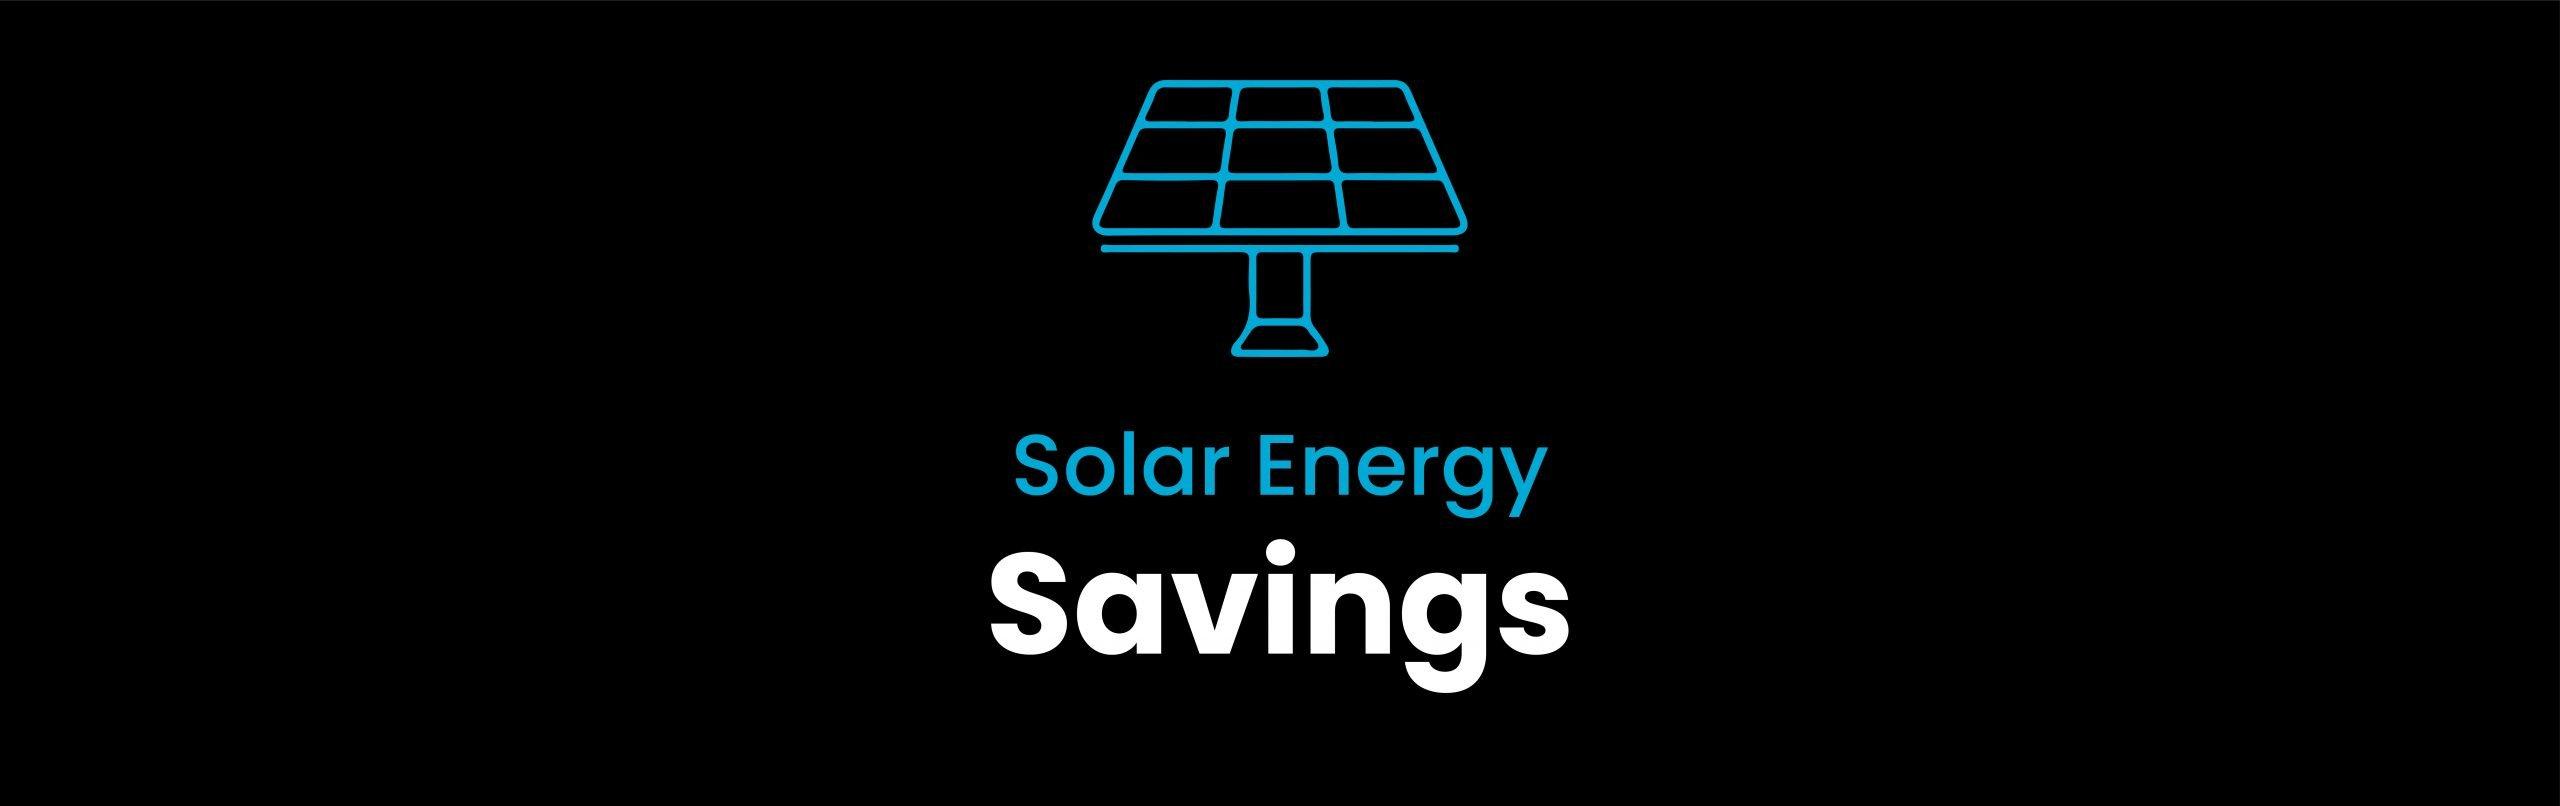 Solar Energy Savings